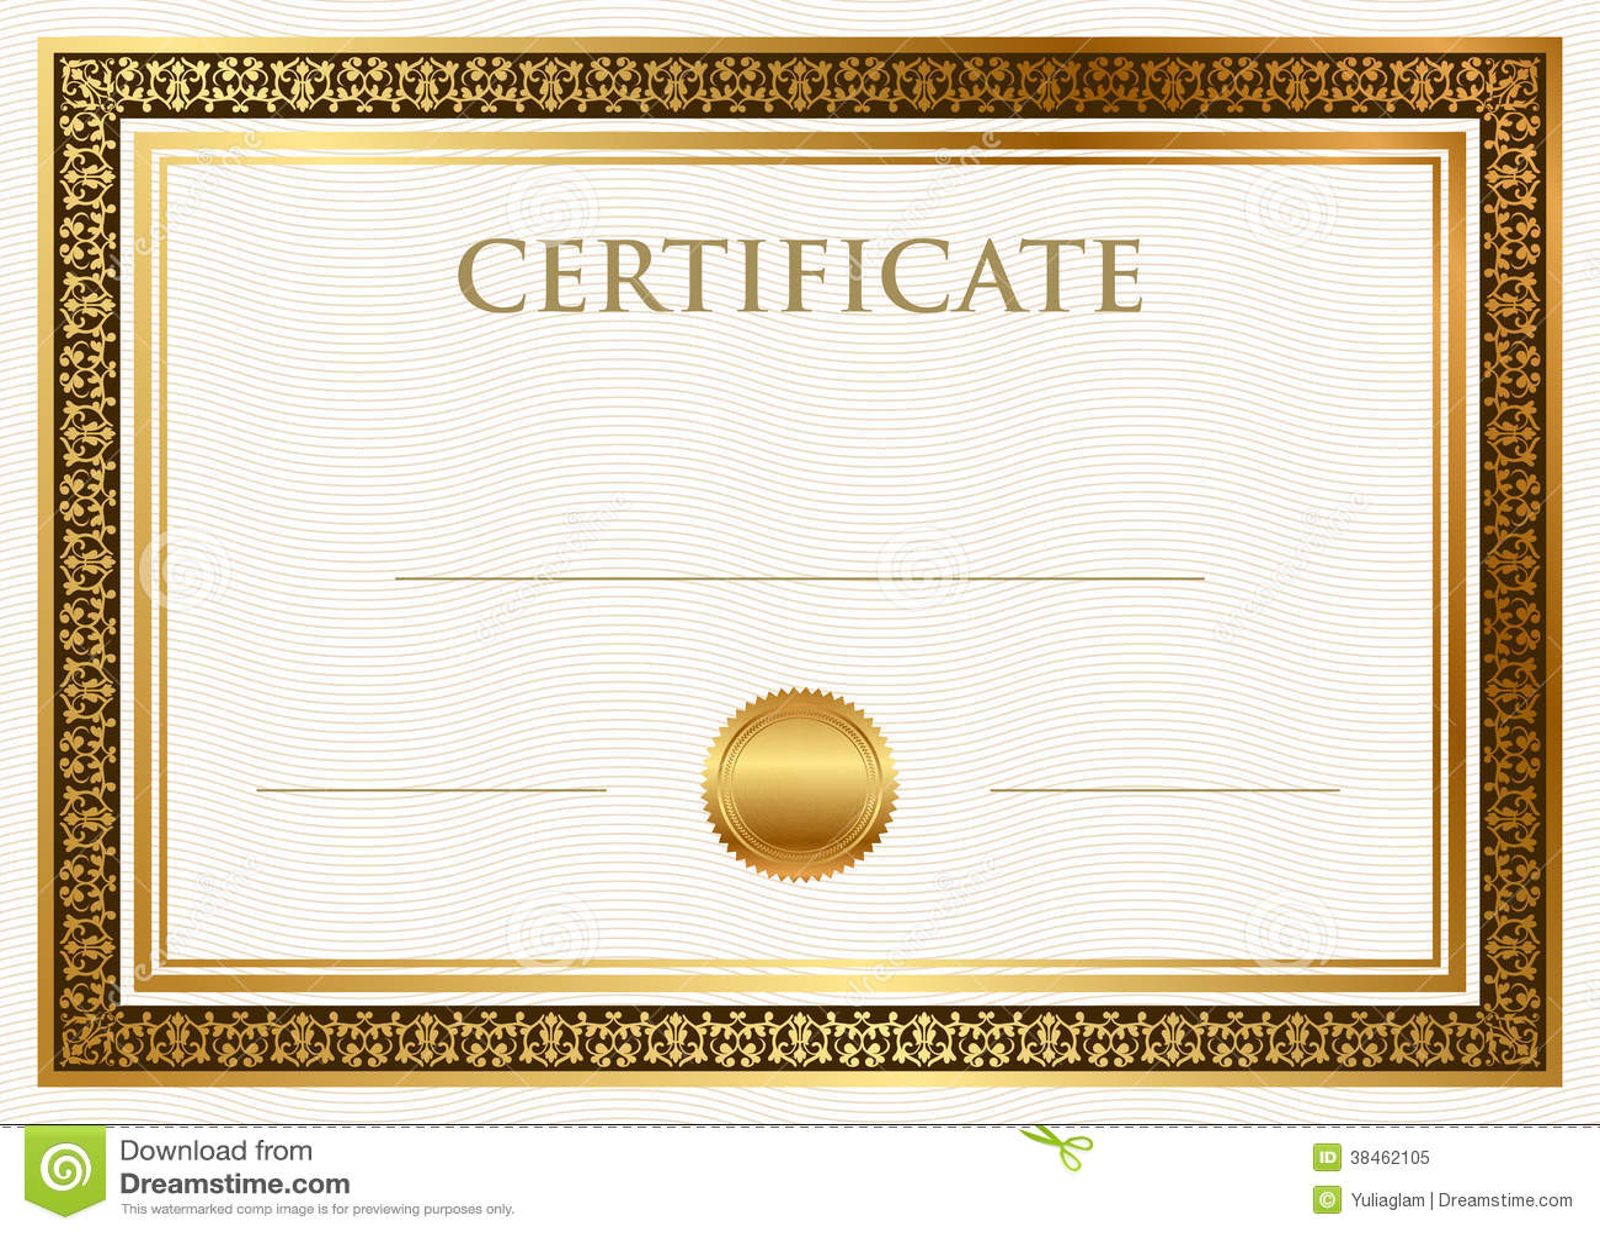 Certificate ...  Free Achievement Certificates